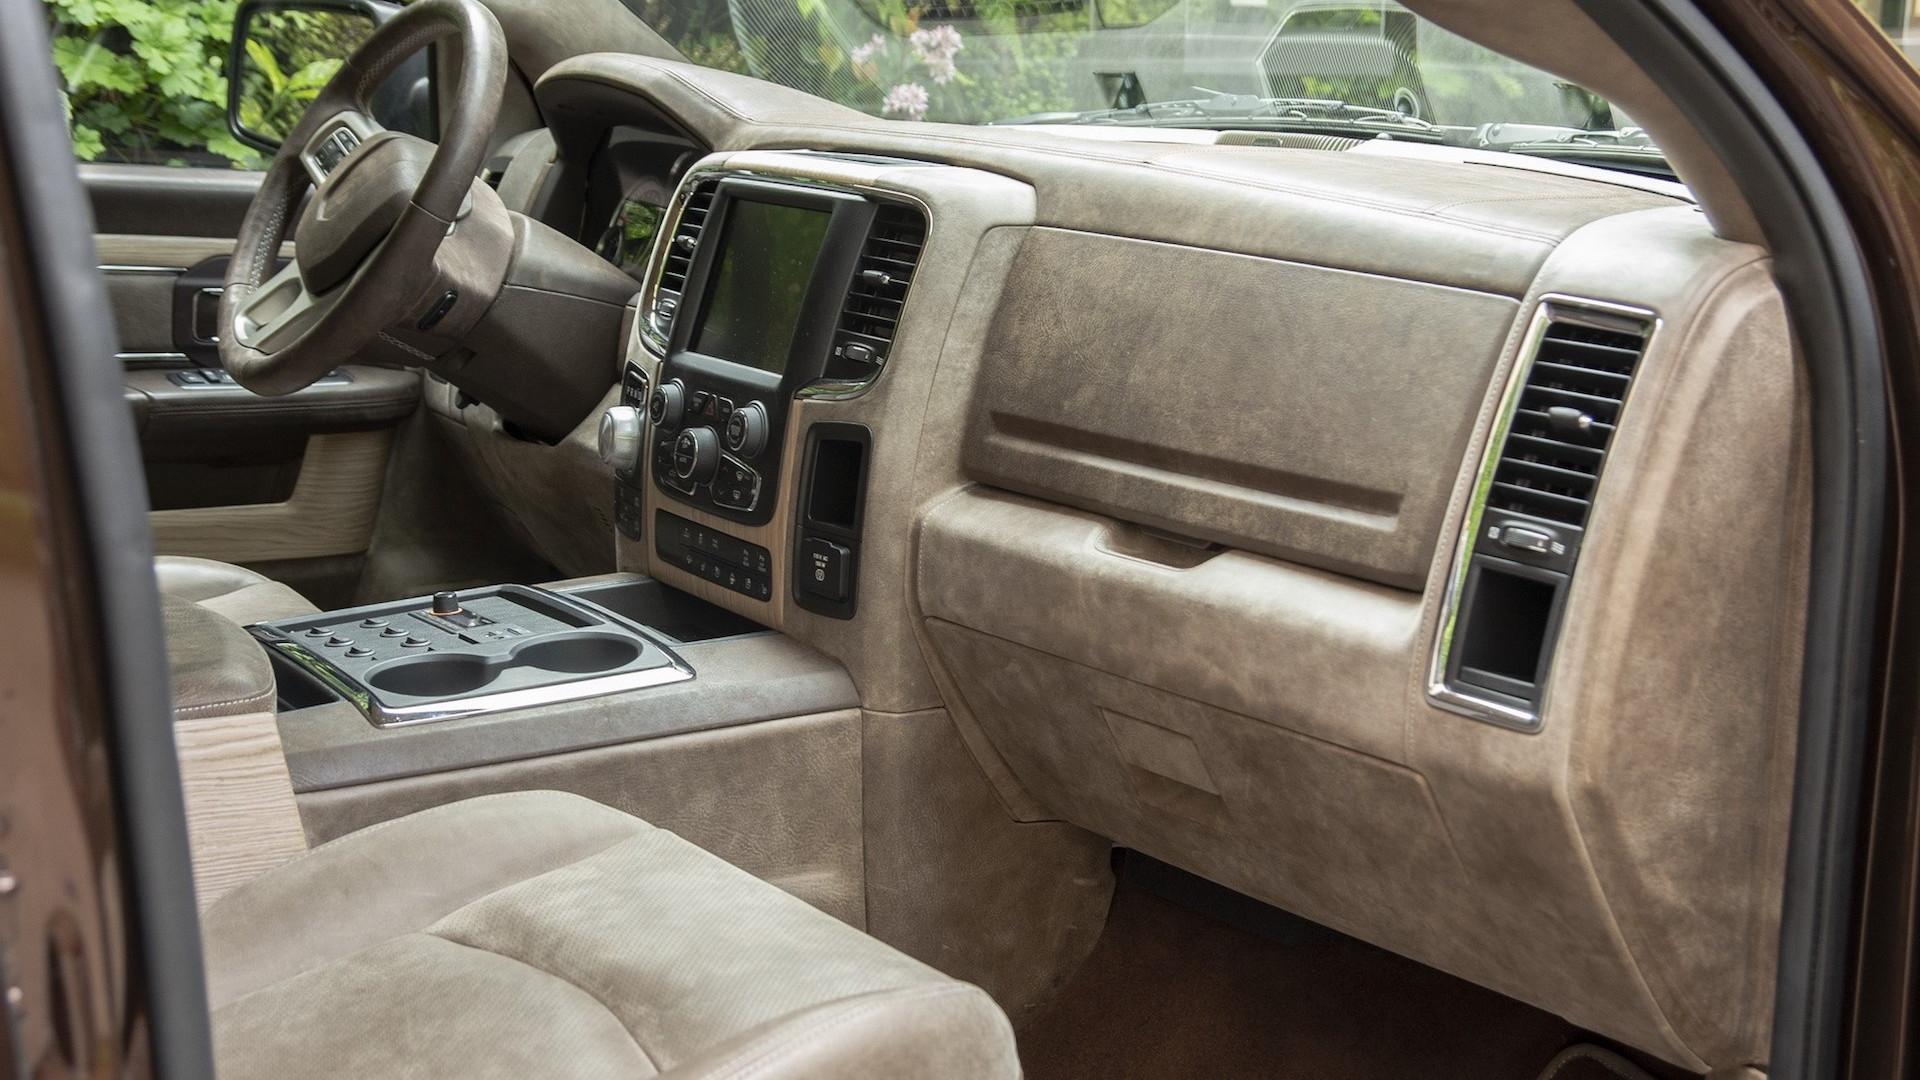 Aznom Atulux coach-built pickup truck